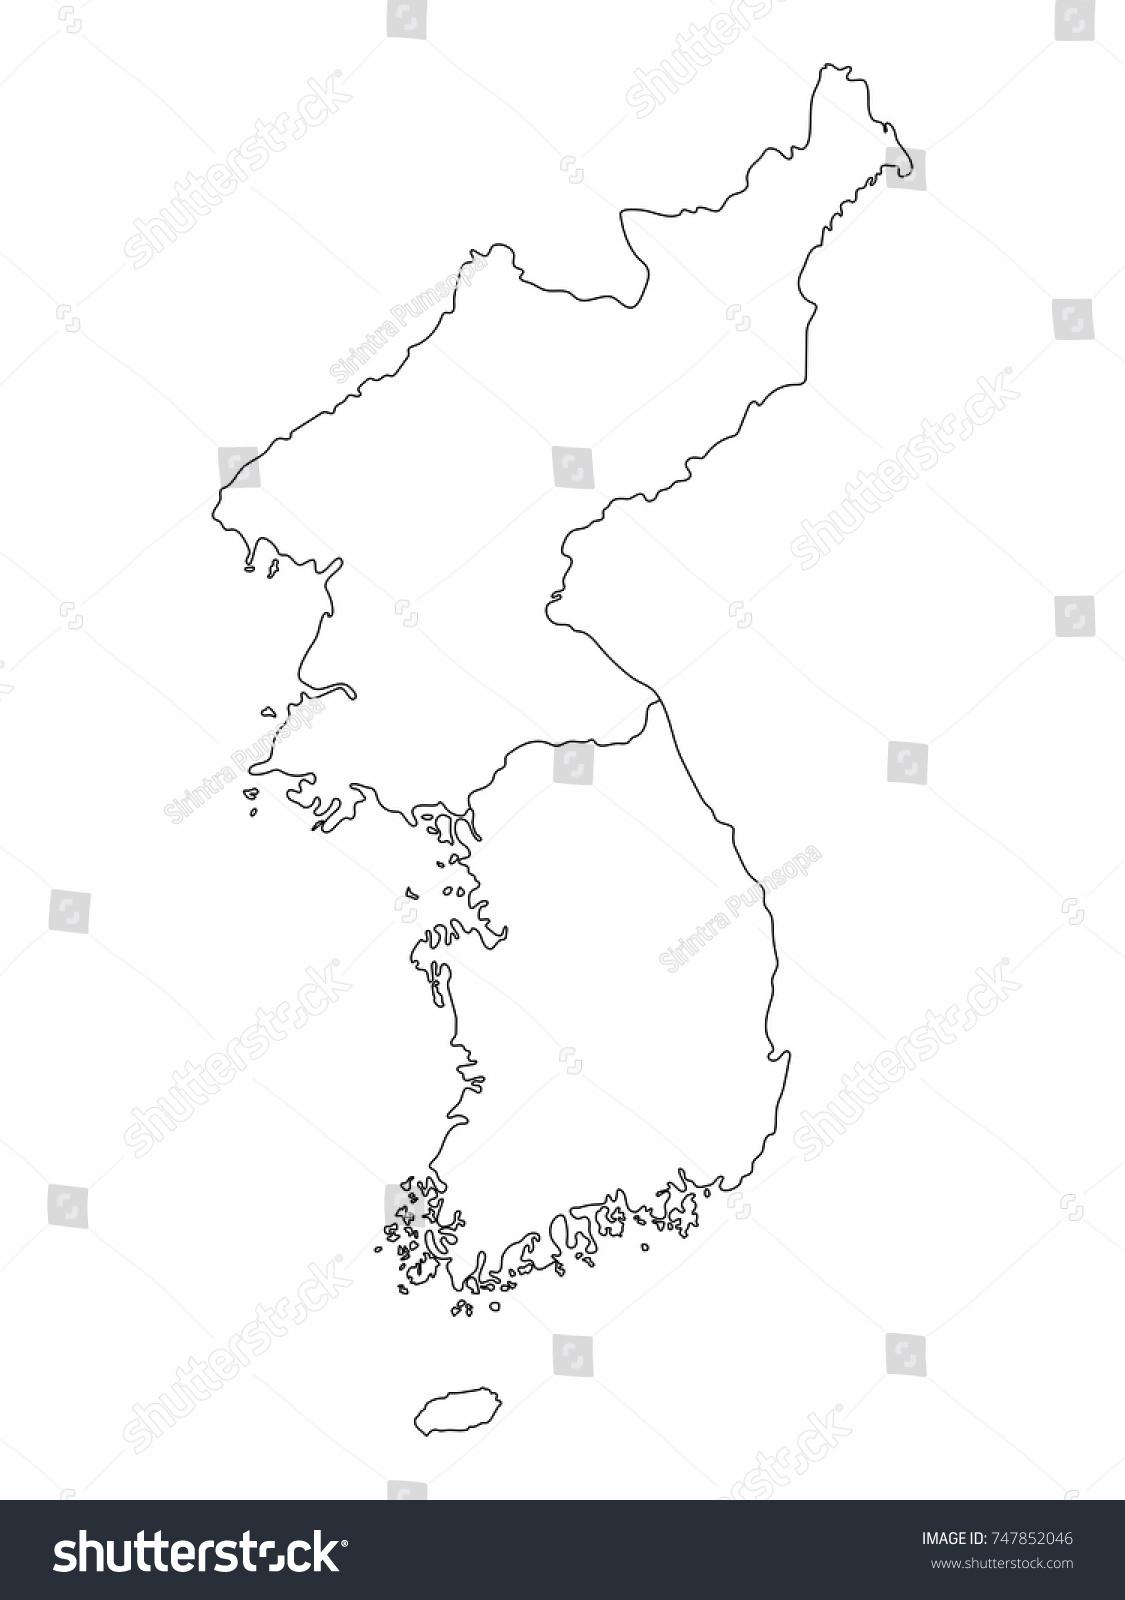 Image of: Vector De Stock Libre De Regalias Sobre North South Korea Map Outline Graphic747852046